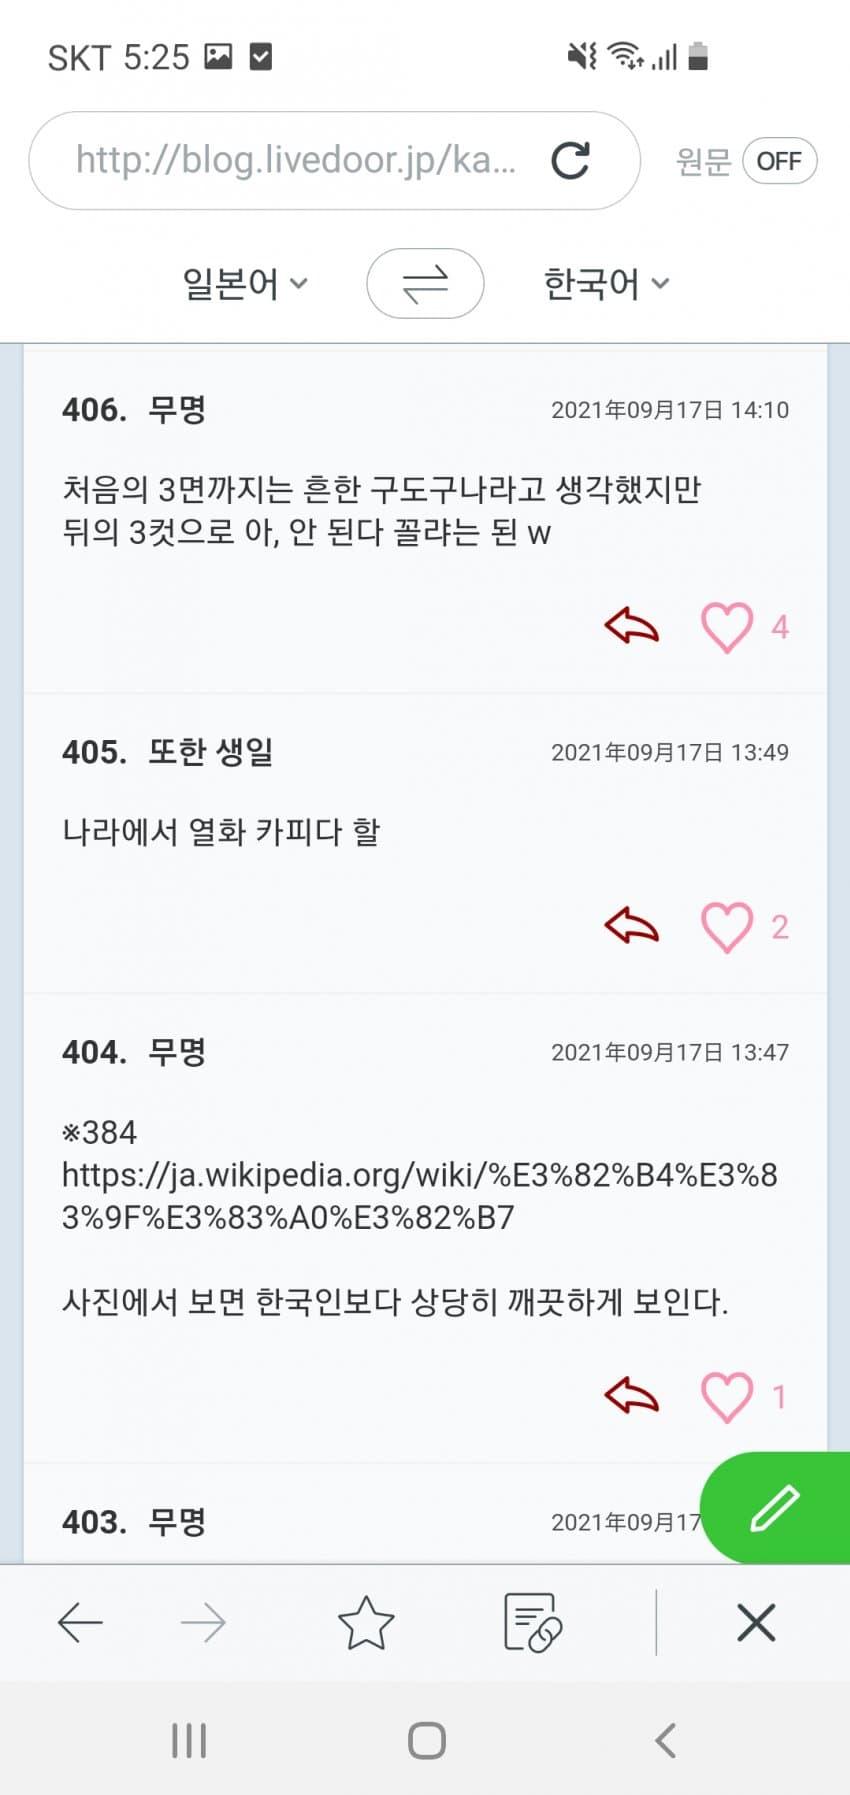 viewimage.php?id=3eb4de21e9d73ab360b8dab04785736f&no=24b0d769e1d32ca73deb87fa11d02831de04ca5aee4f7f339edb1c2bda417836592184320dbaeca2d8c5332fabb1603ffea90ae4456e3d9251173ca217c8b5115c91e026ed86b582d93ec3022659e0dfed7f8672658d3397b434aea4c69744bb3777f6fffe32a6c07cfcc37bb9